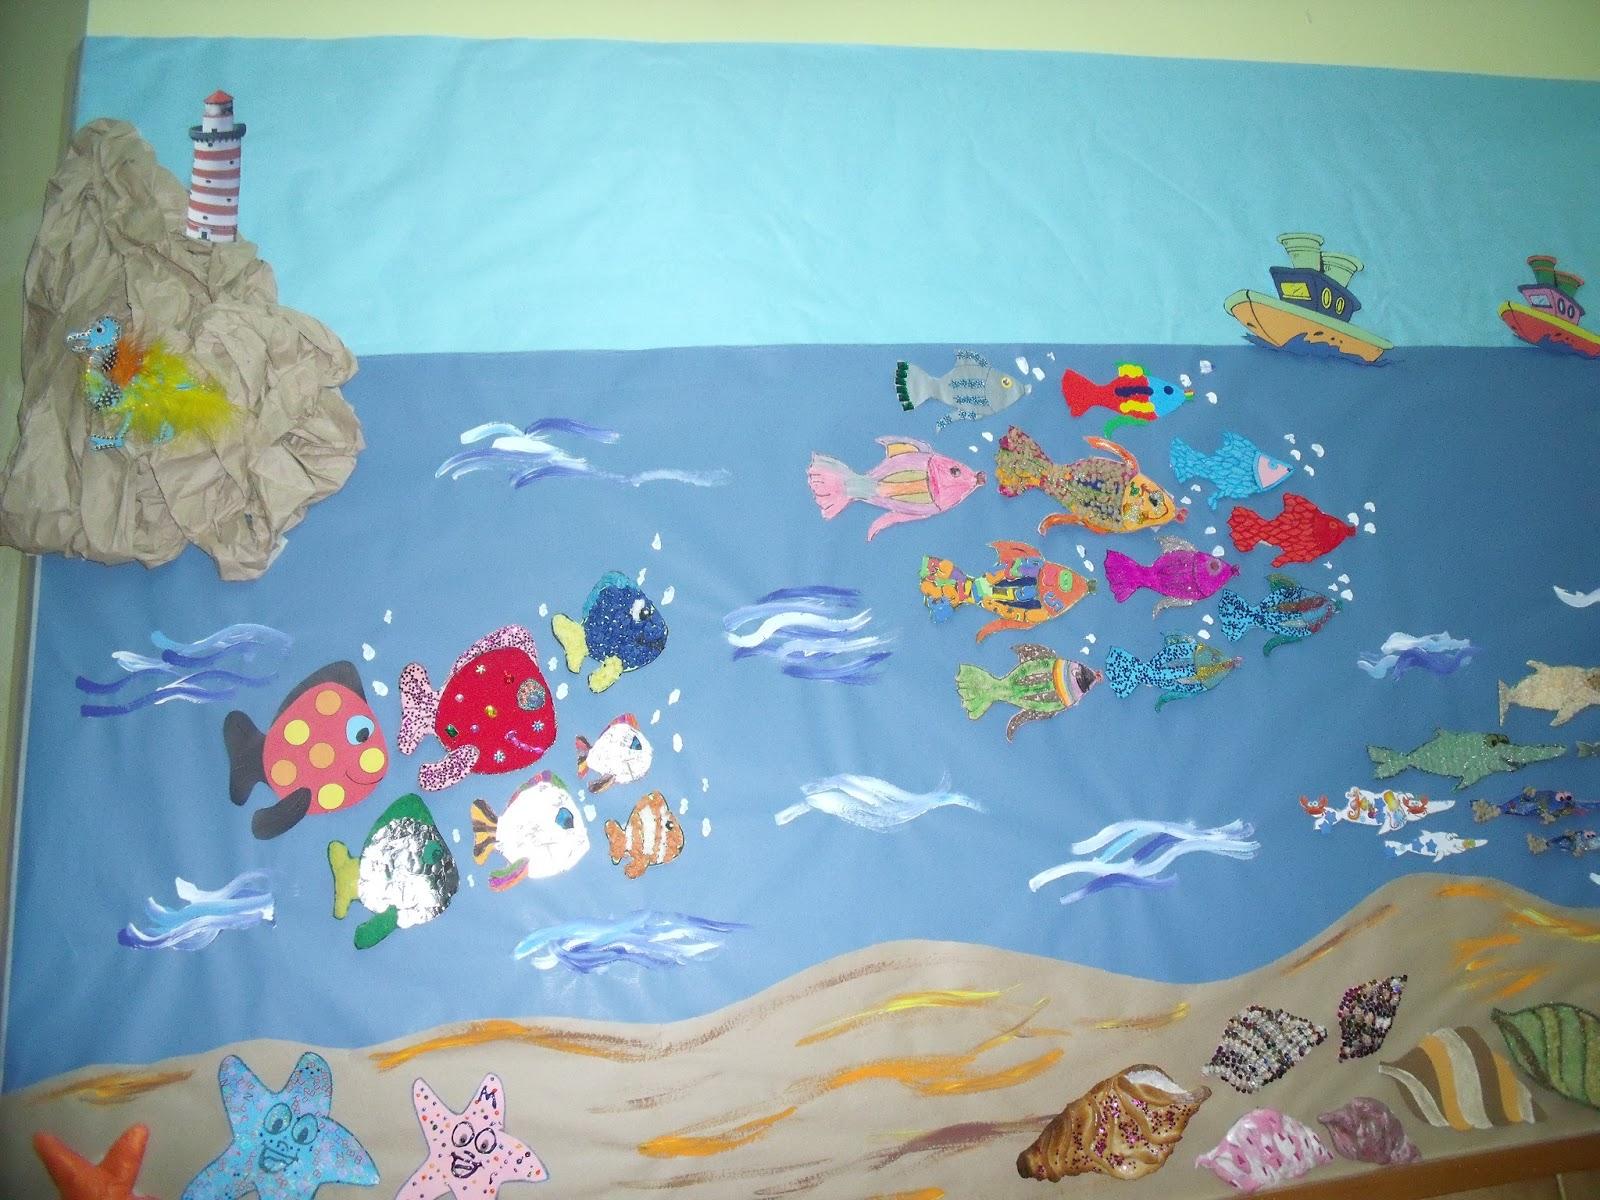 Valdellera infantil mural colectivo el mar - Murales para ninos ...